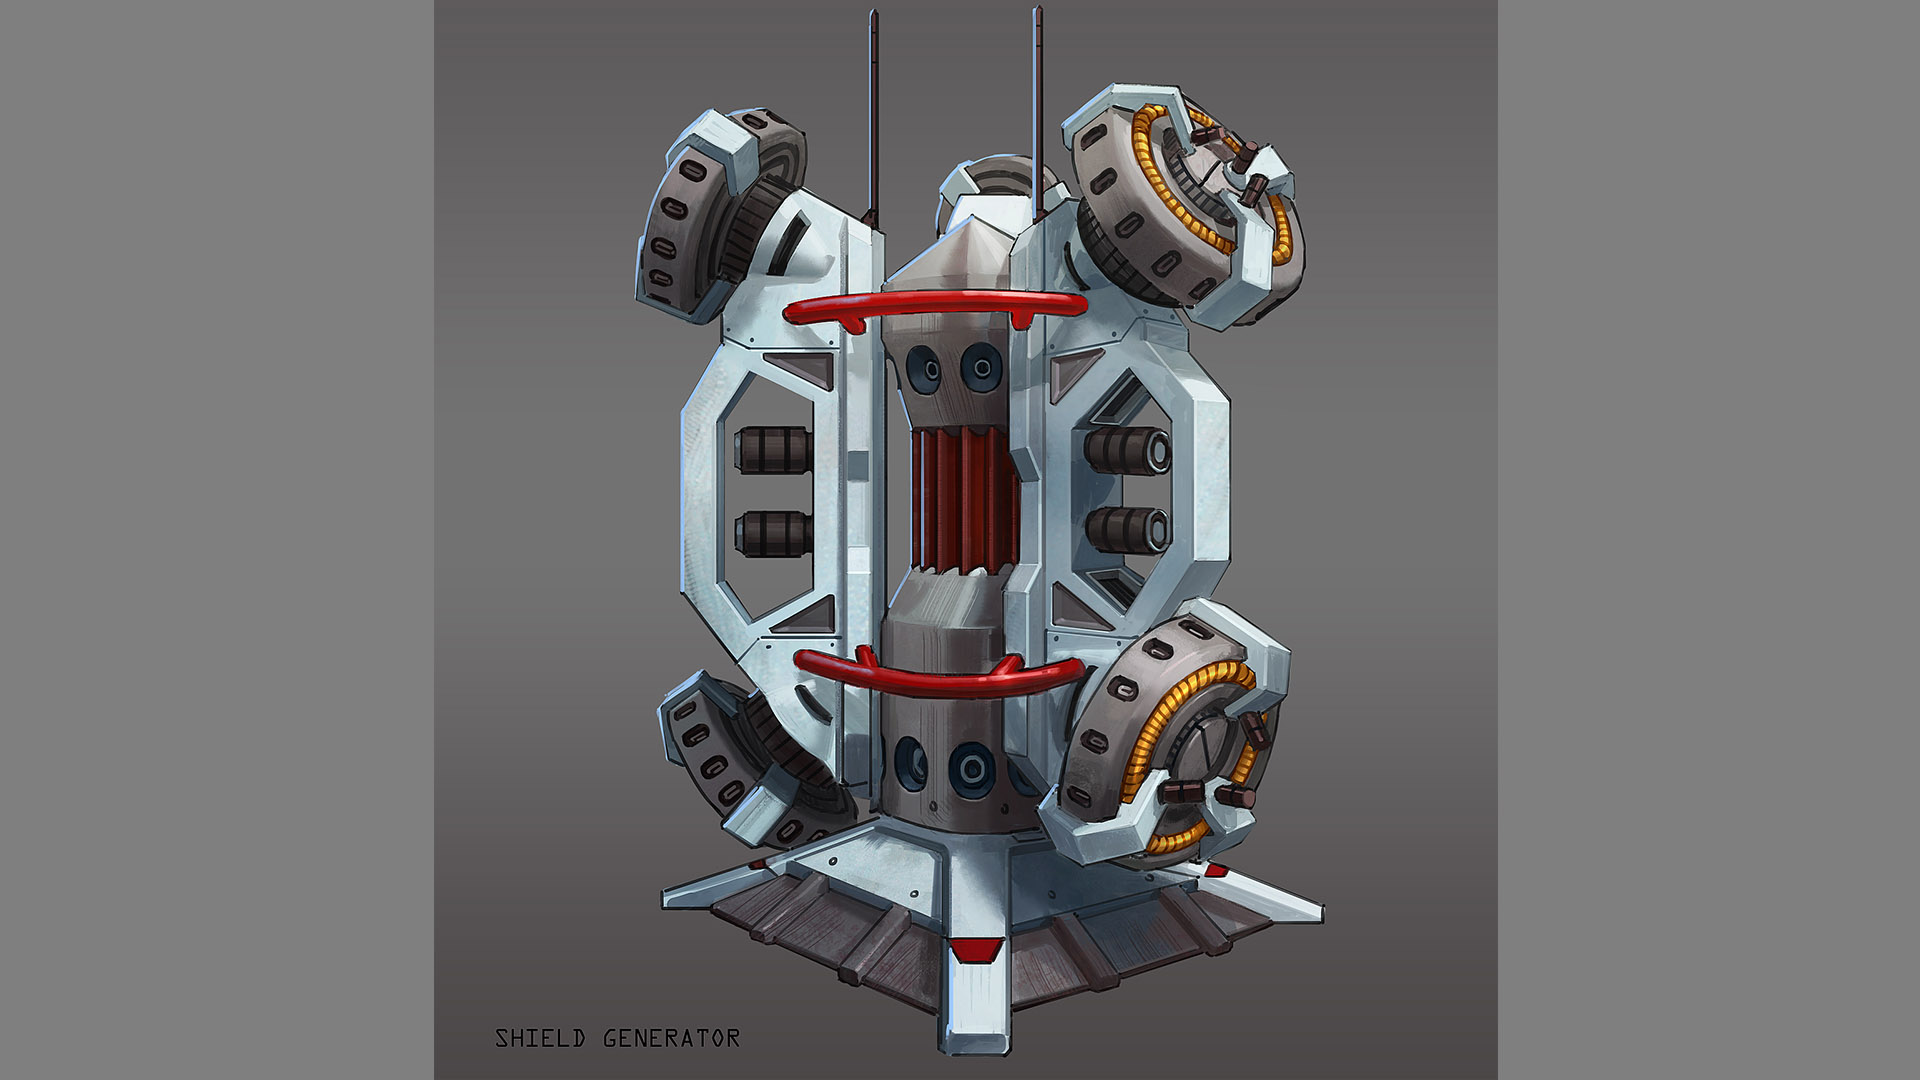 shield generator final